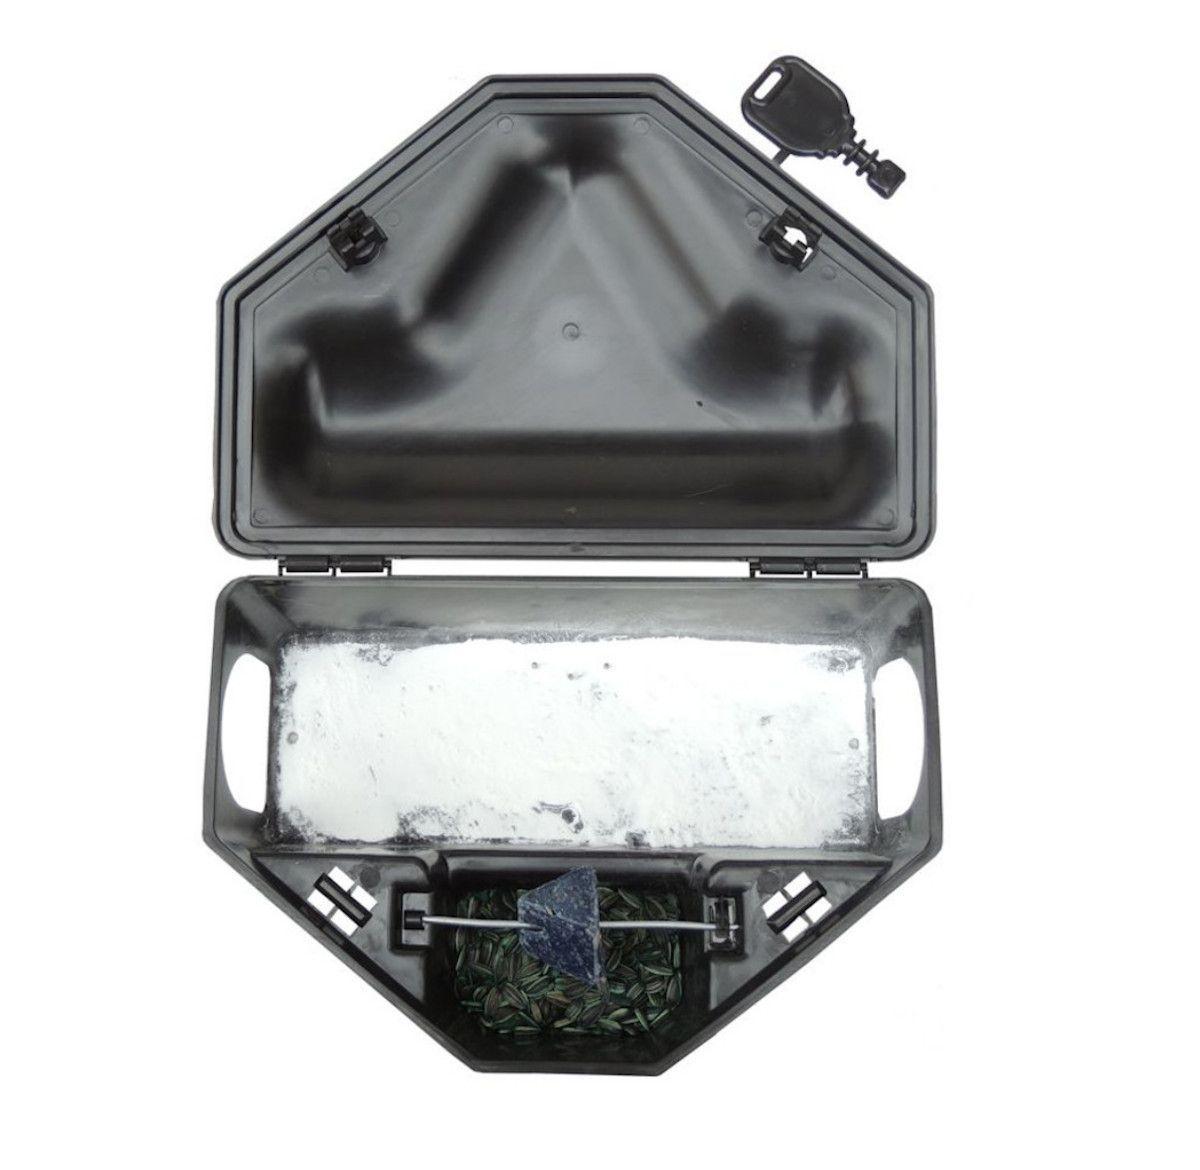 Kit 41 Porta Isca Com 2 Chaves - Duplo Travamento